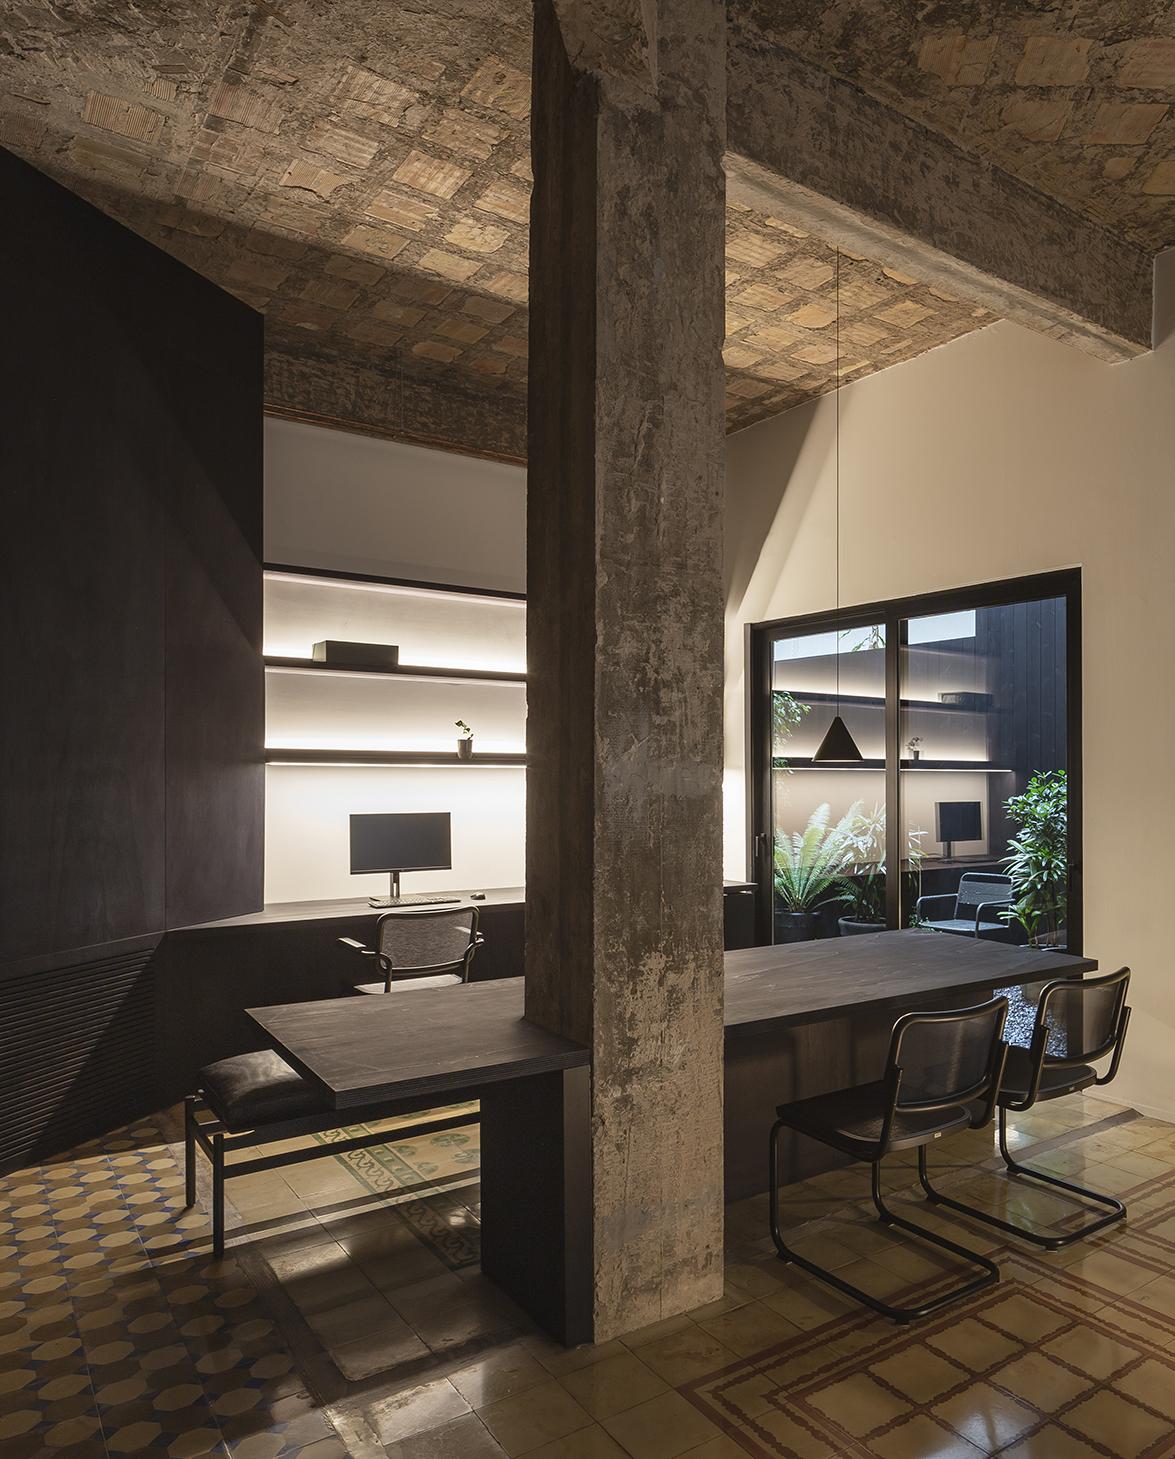 Francesc Rifé Diseña R-Apartment, Deconstruir El Espacio